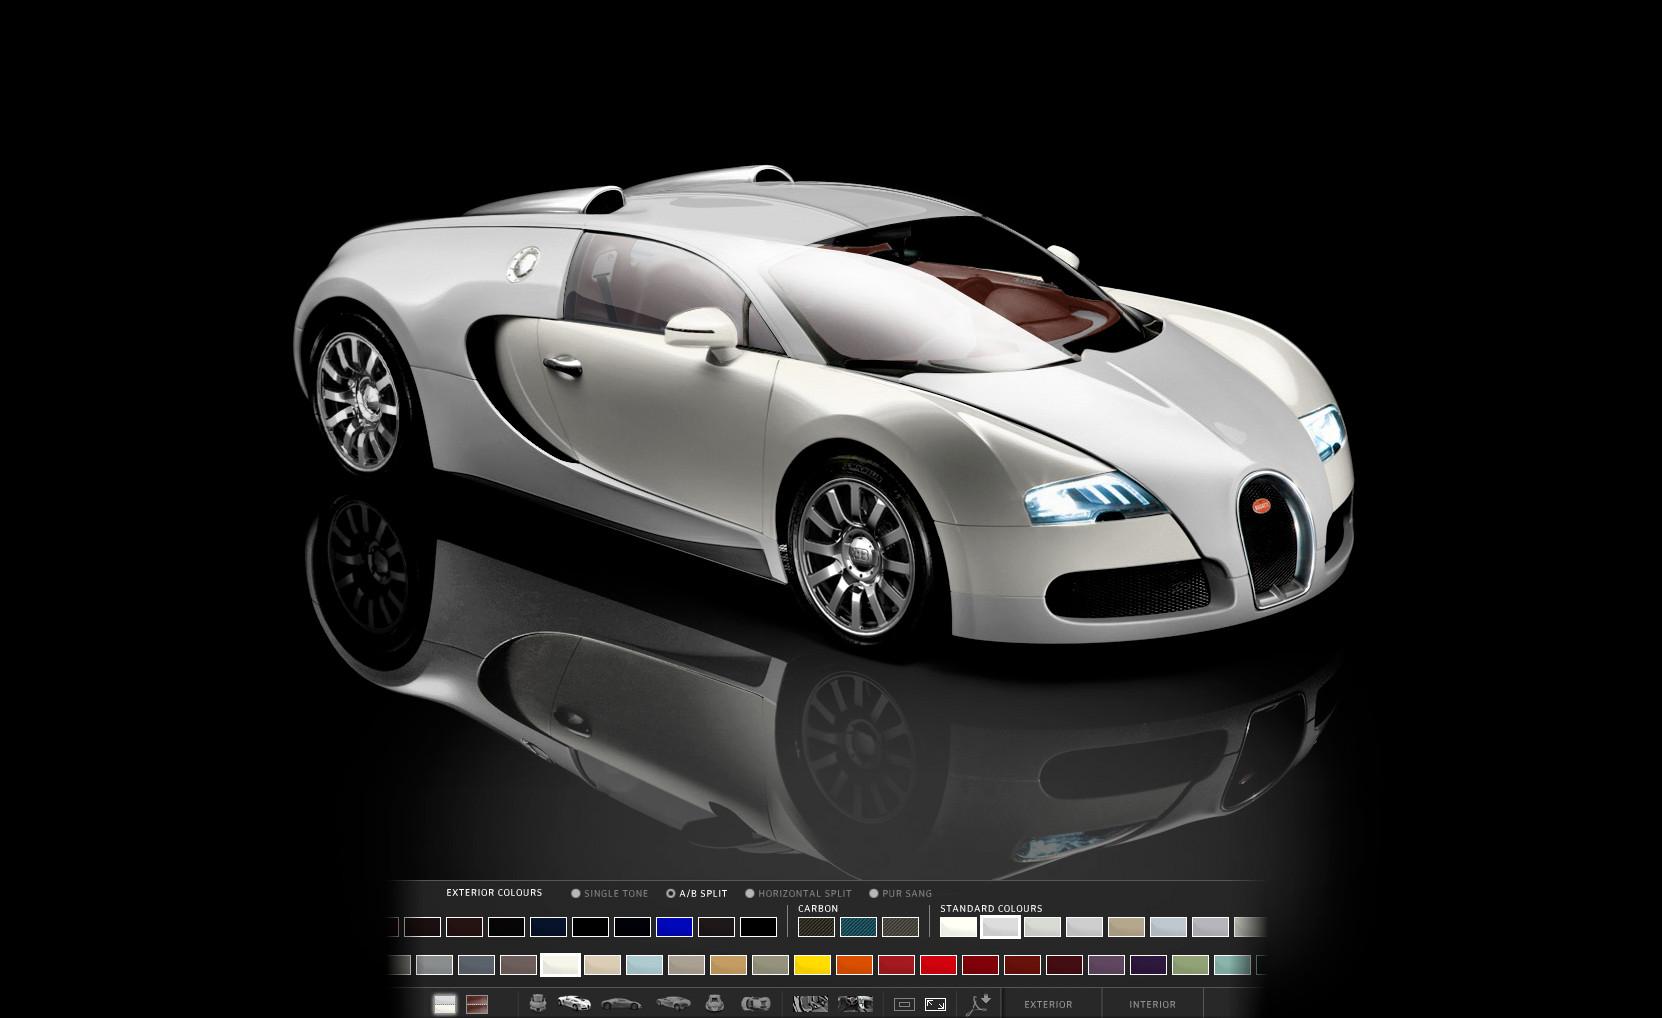 bugatti veyron configurator goes online autoevolution. Black Bedroom Furniture Sets. Home Design Ideas